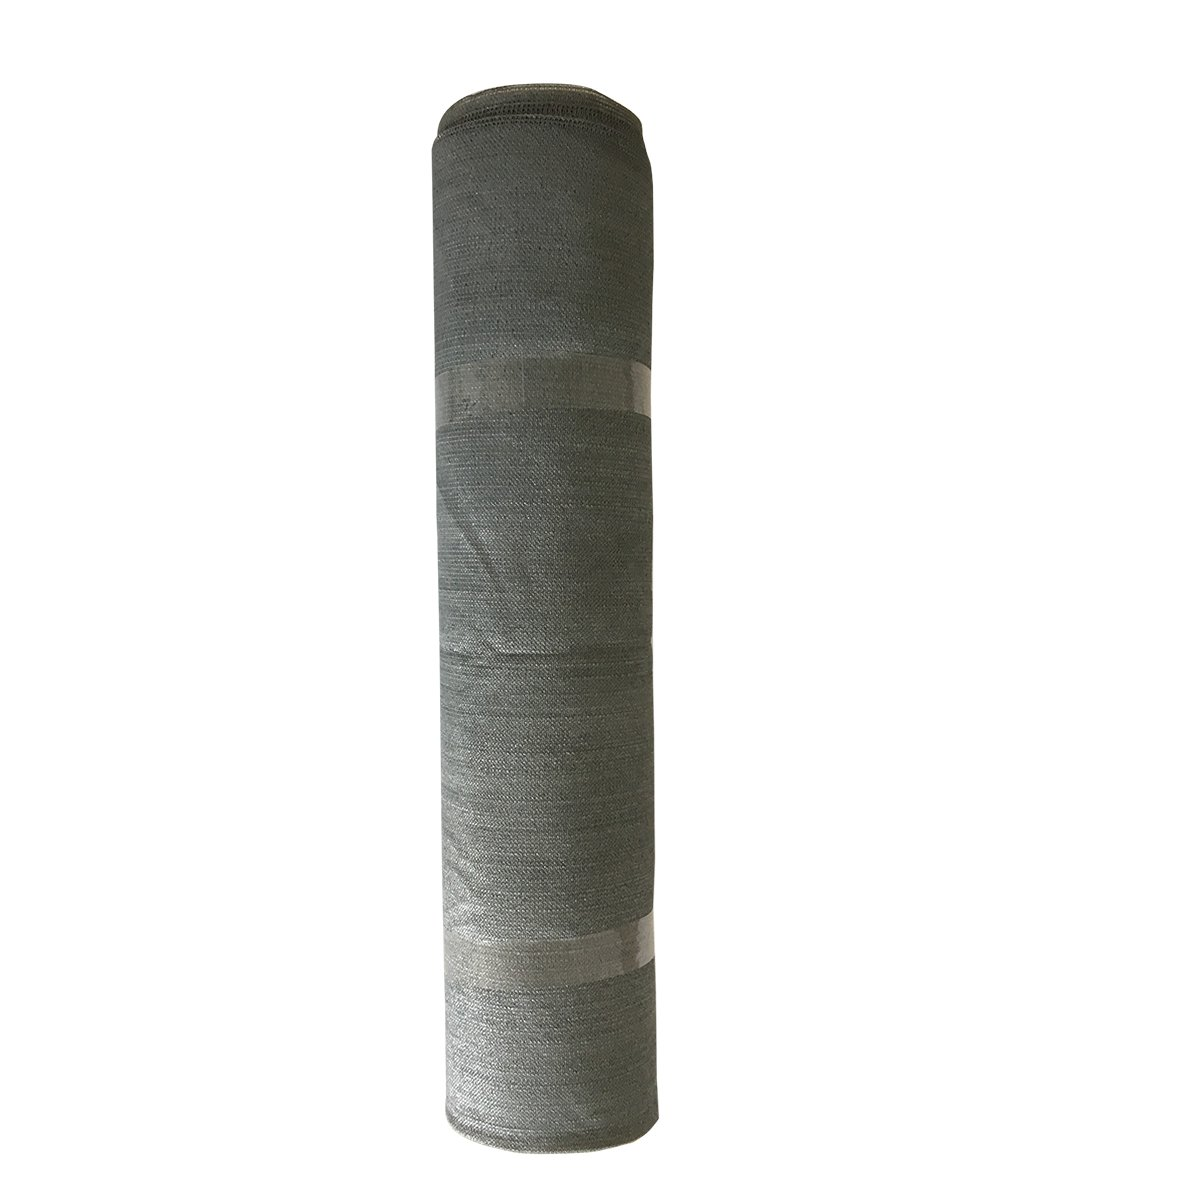 Shatex ShadeShatex 90% Sun Shade Fabric for Pergola Cover Porch Vertical Screen 10' x 50', Grey